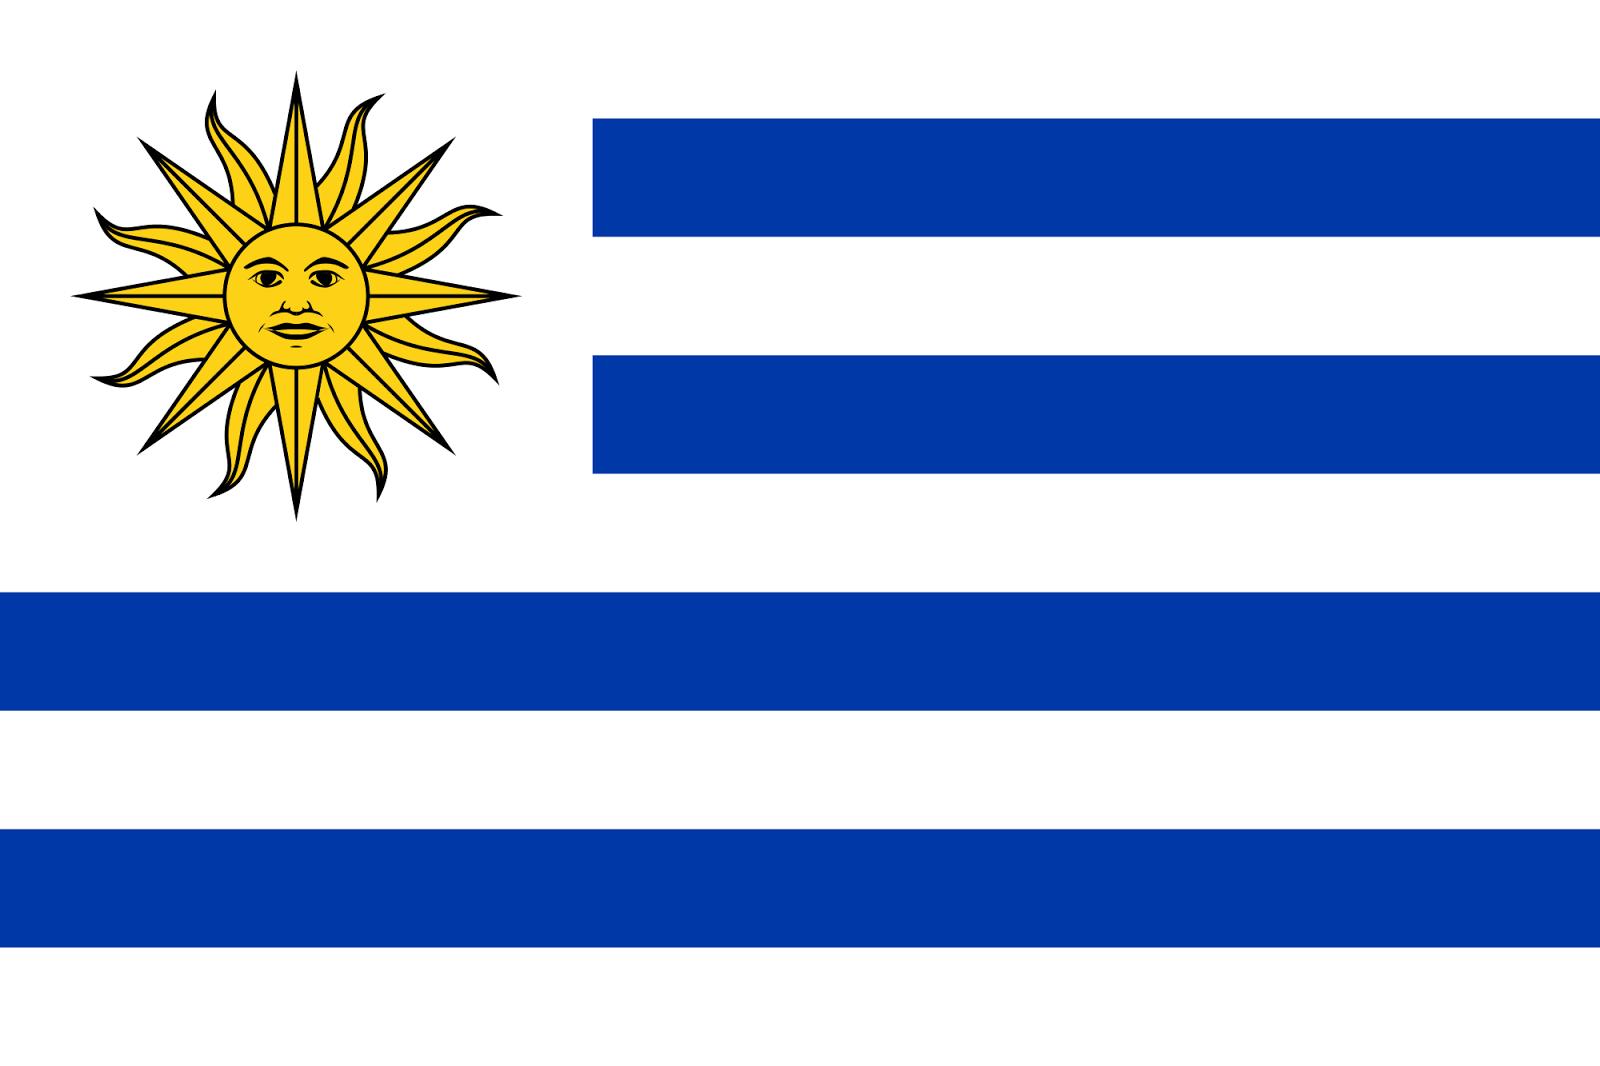 http://carbrandsincurrentproduction.blogspot.com.es/search/label/Uruguay